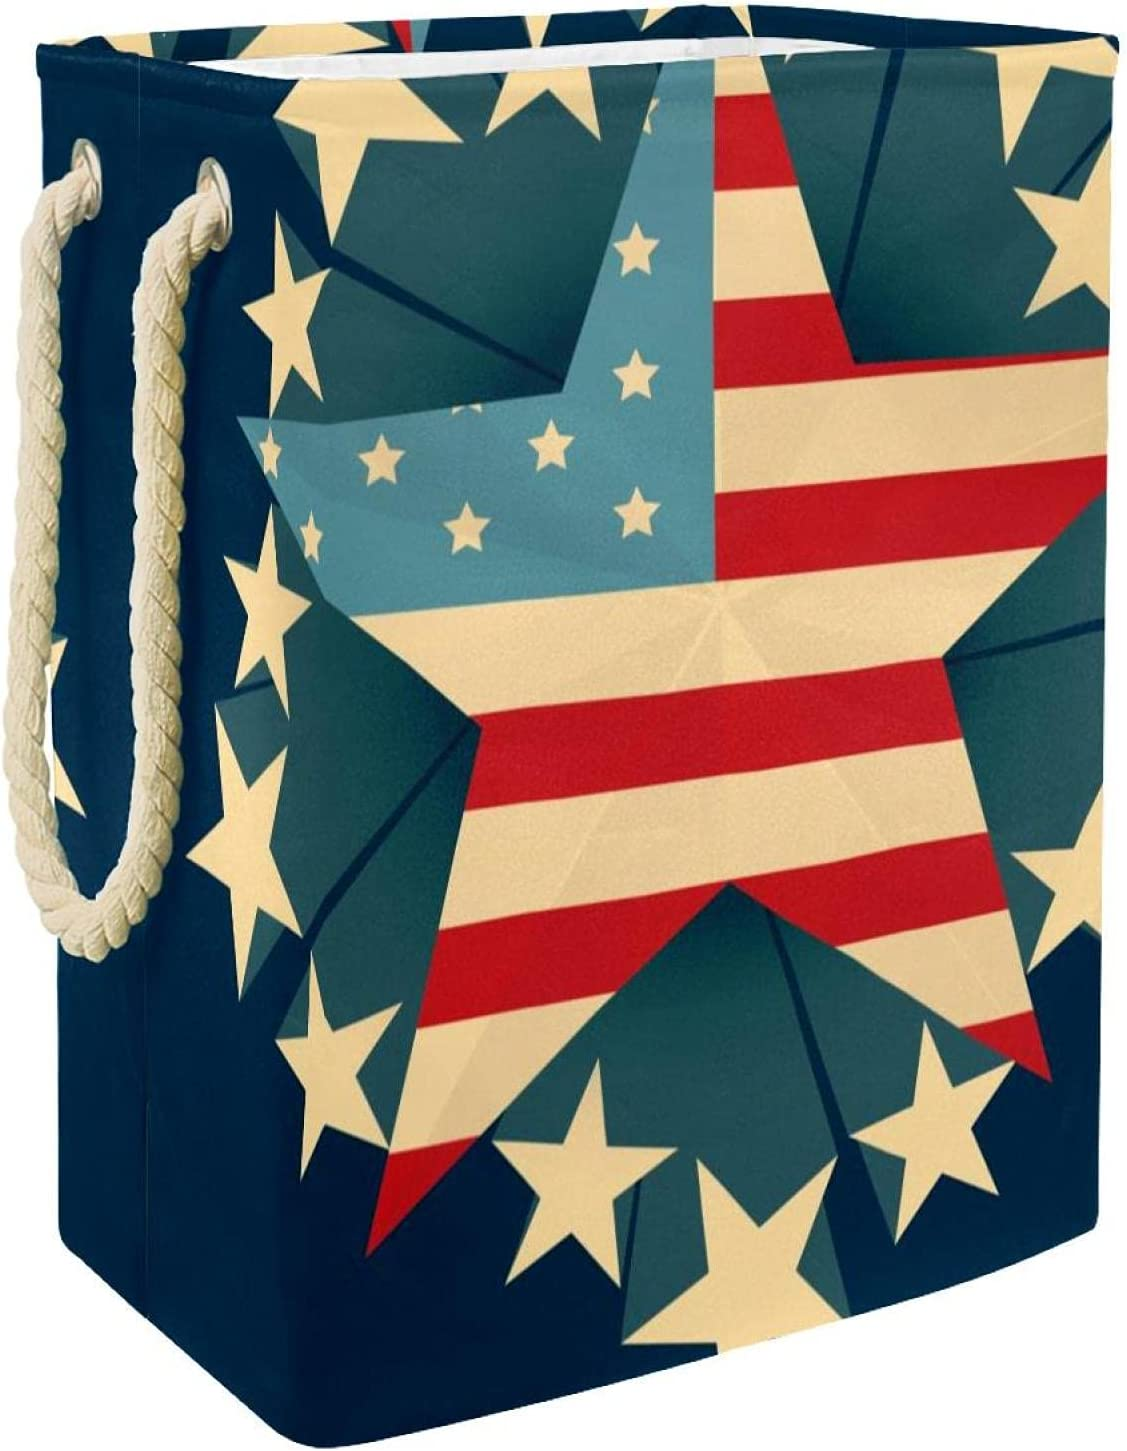 Luxury goods Laundry Hamper Creative Max 59% OFF American Flag Stars Navy Linen Foldable